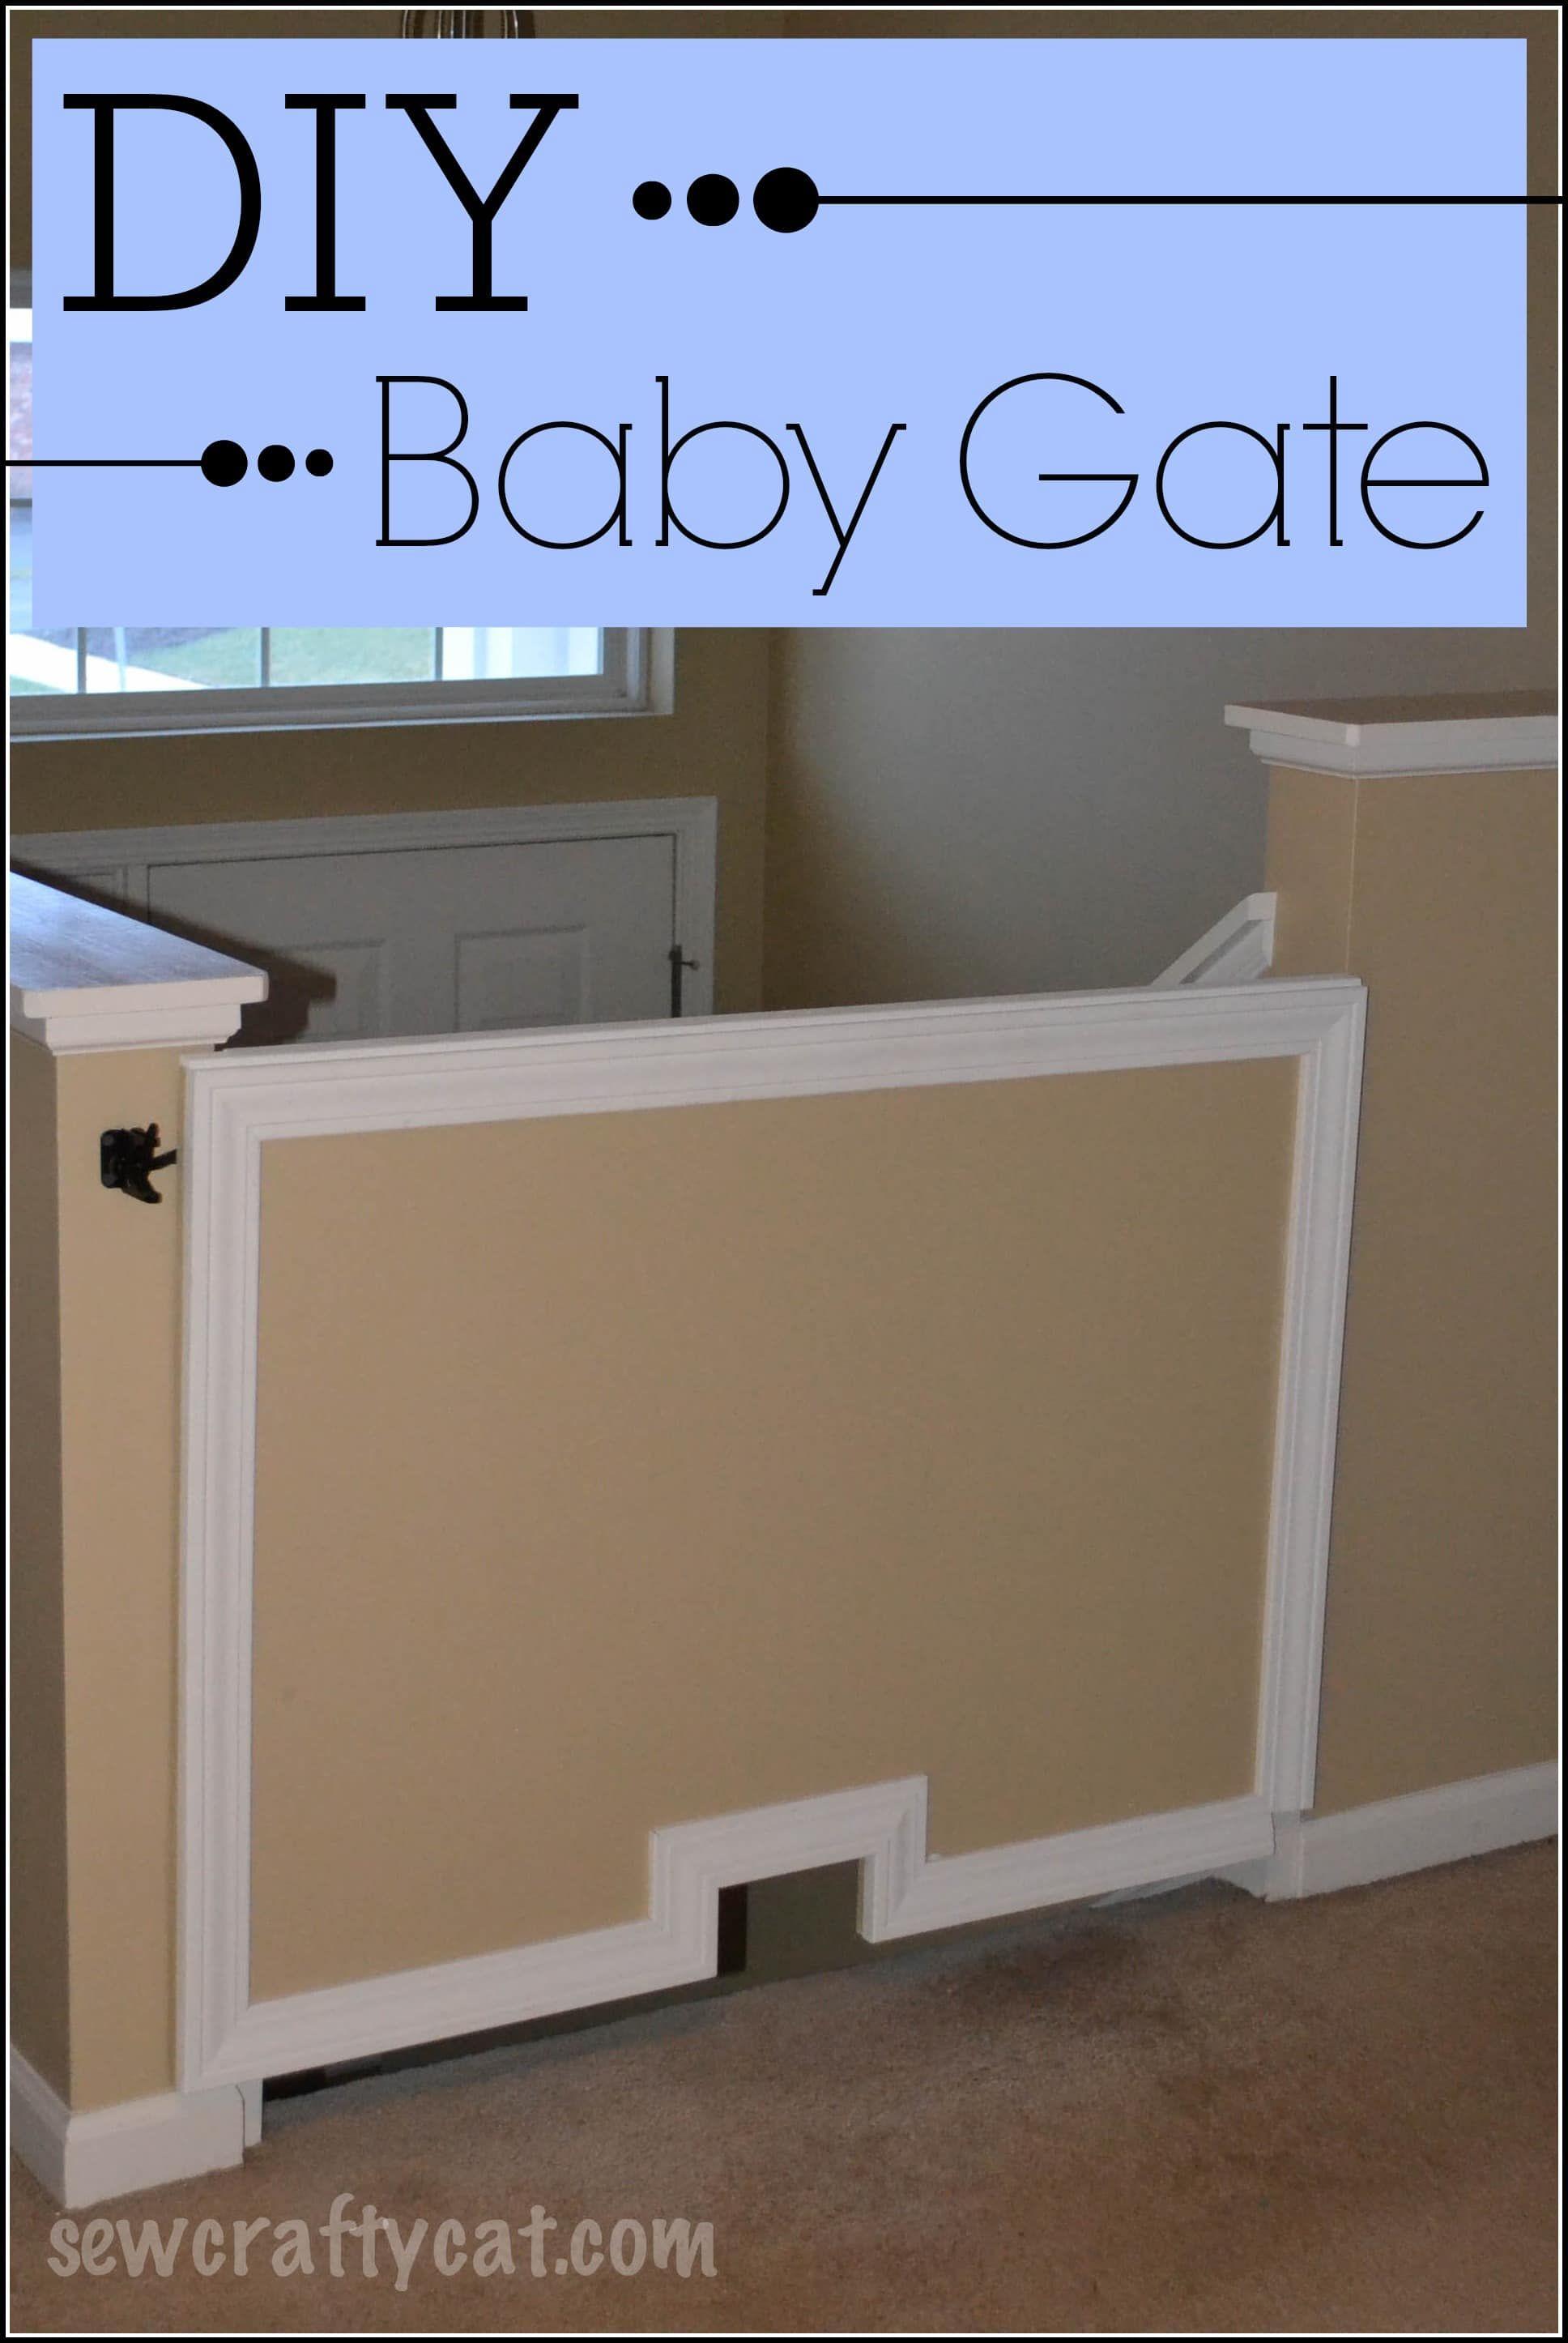 Diy Baby Gate Diy Baby Gate Baby Gates Diy Baby Stuff